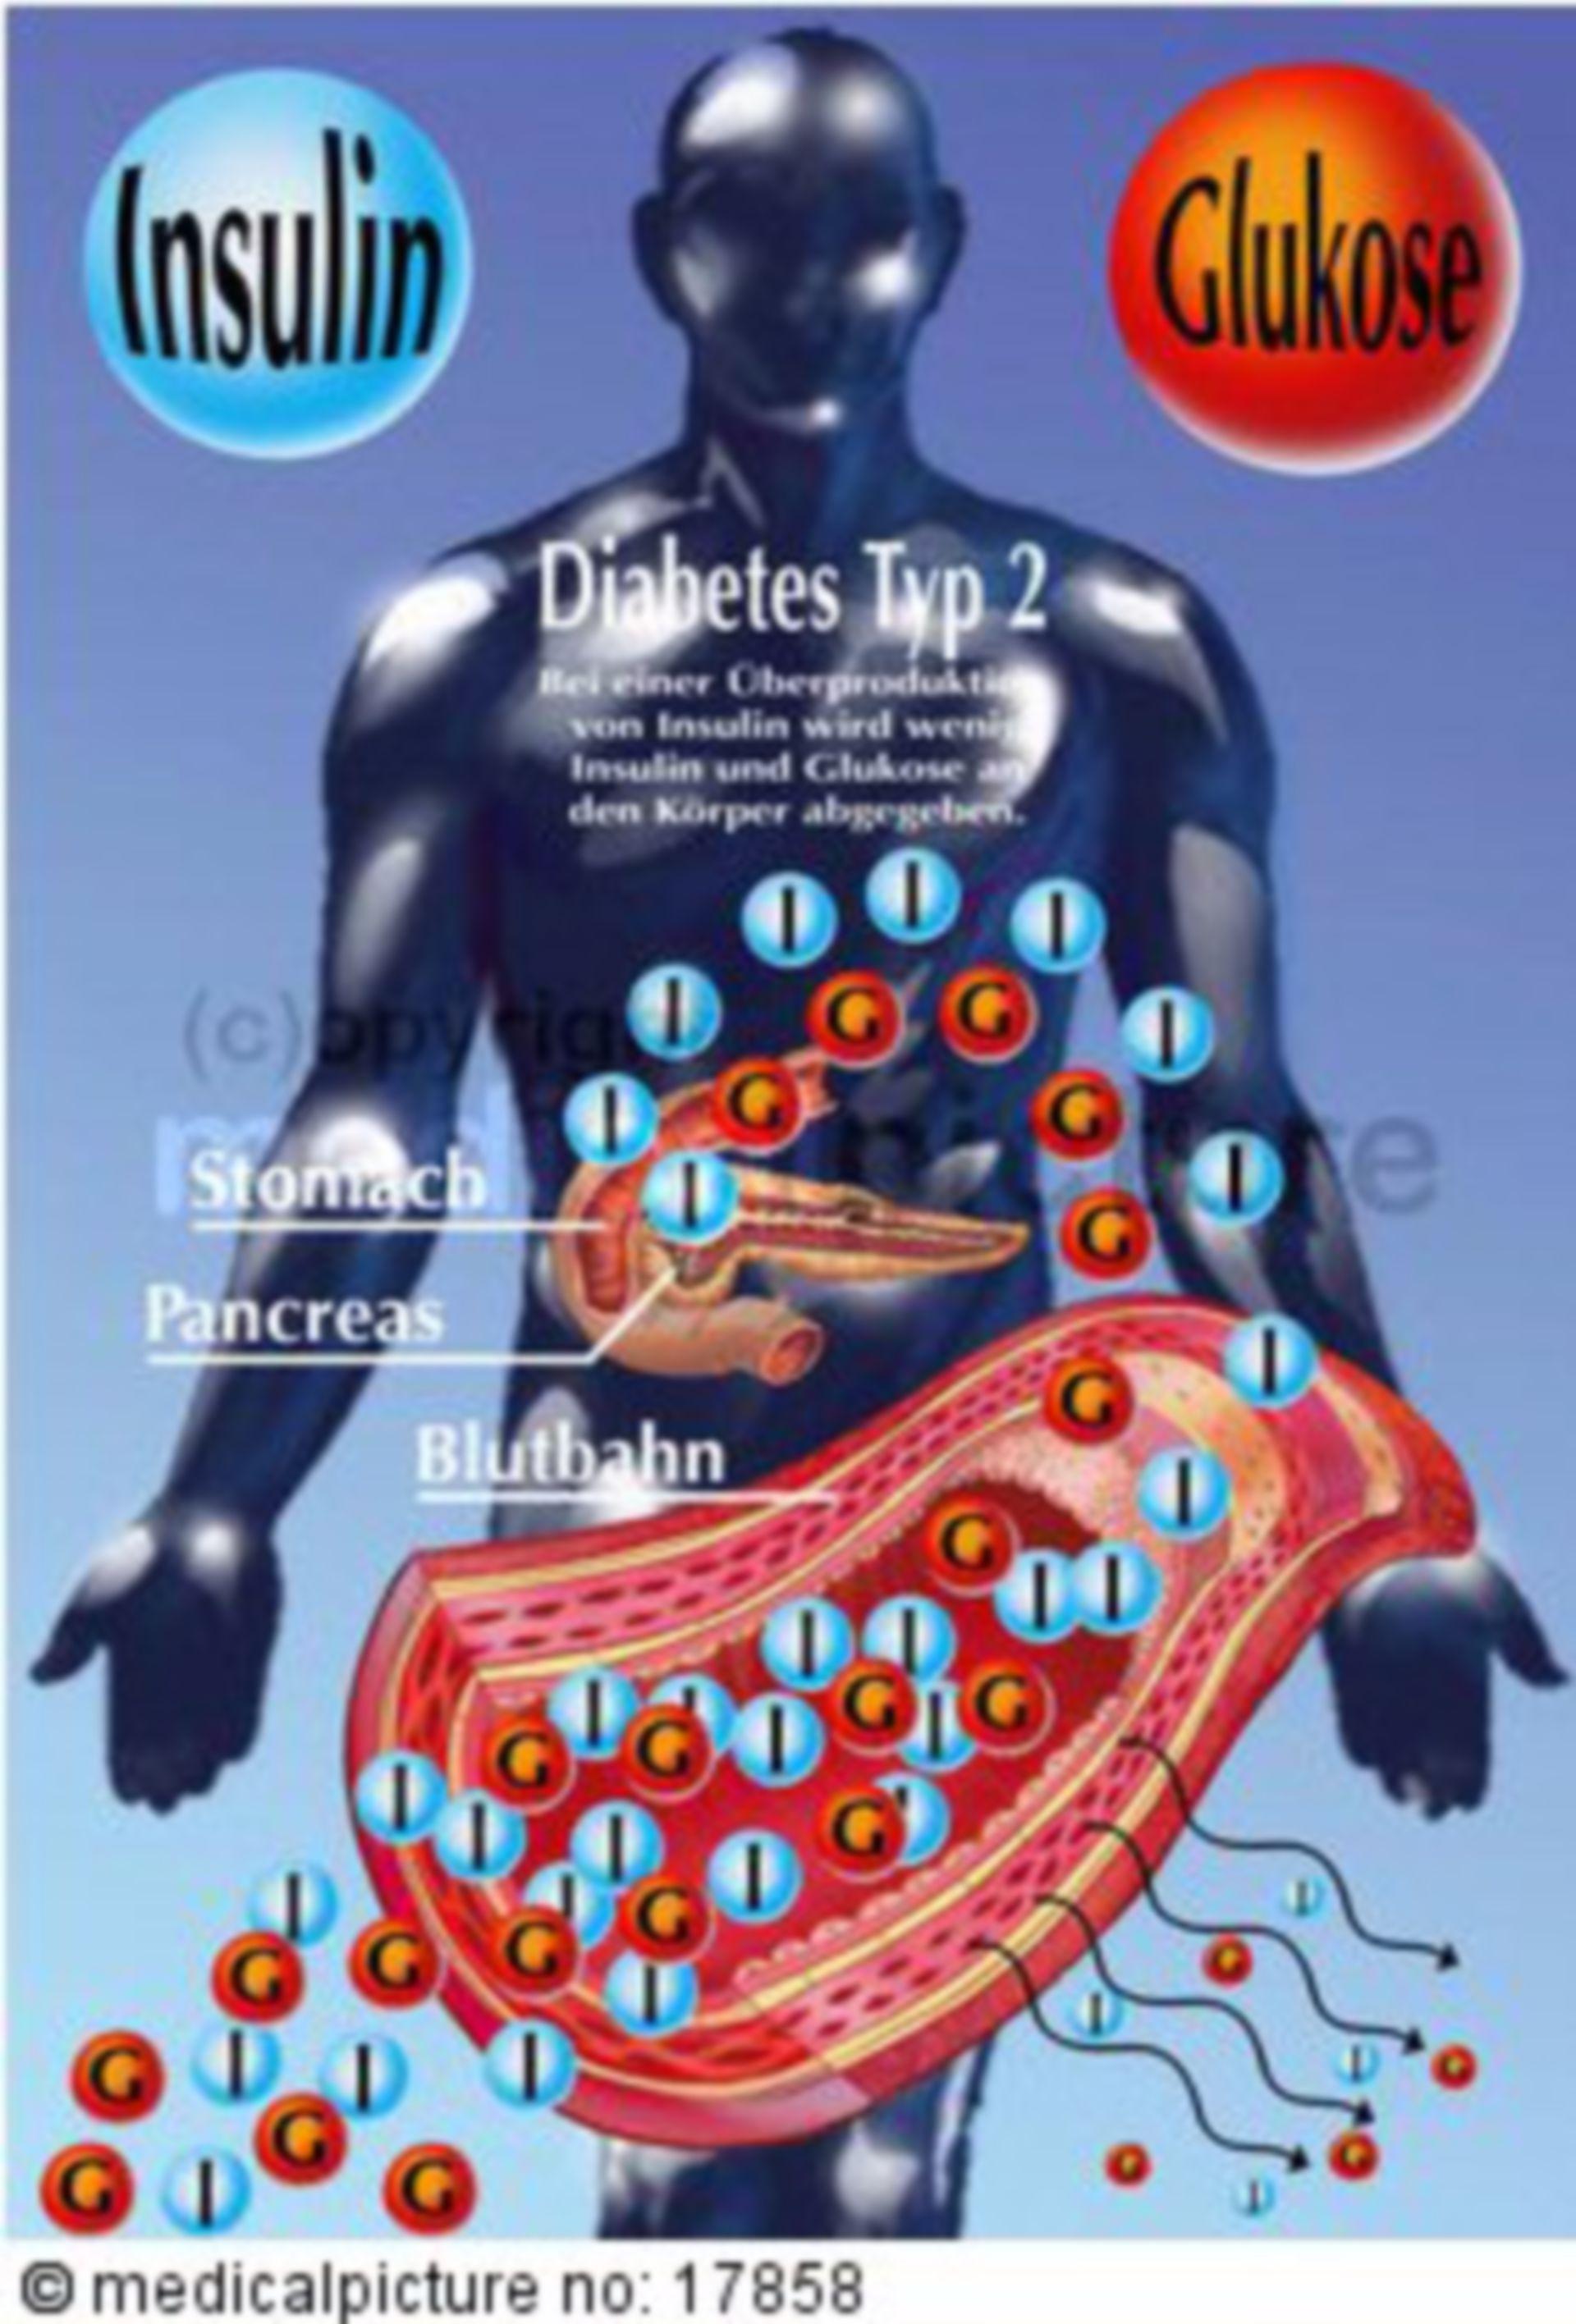 Insulin secretion of people with type II diabetes